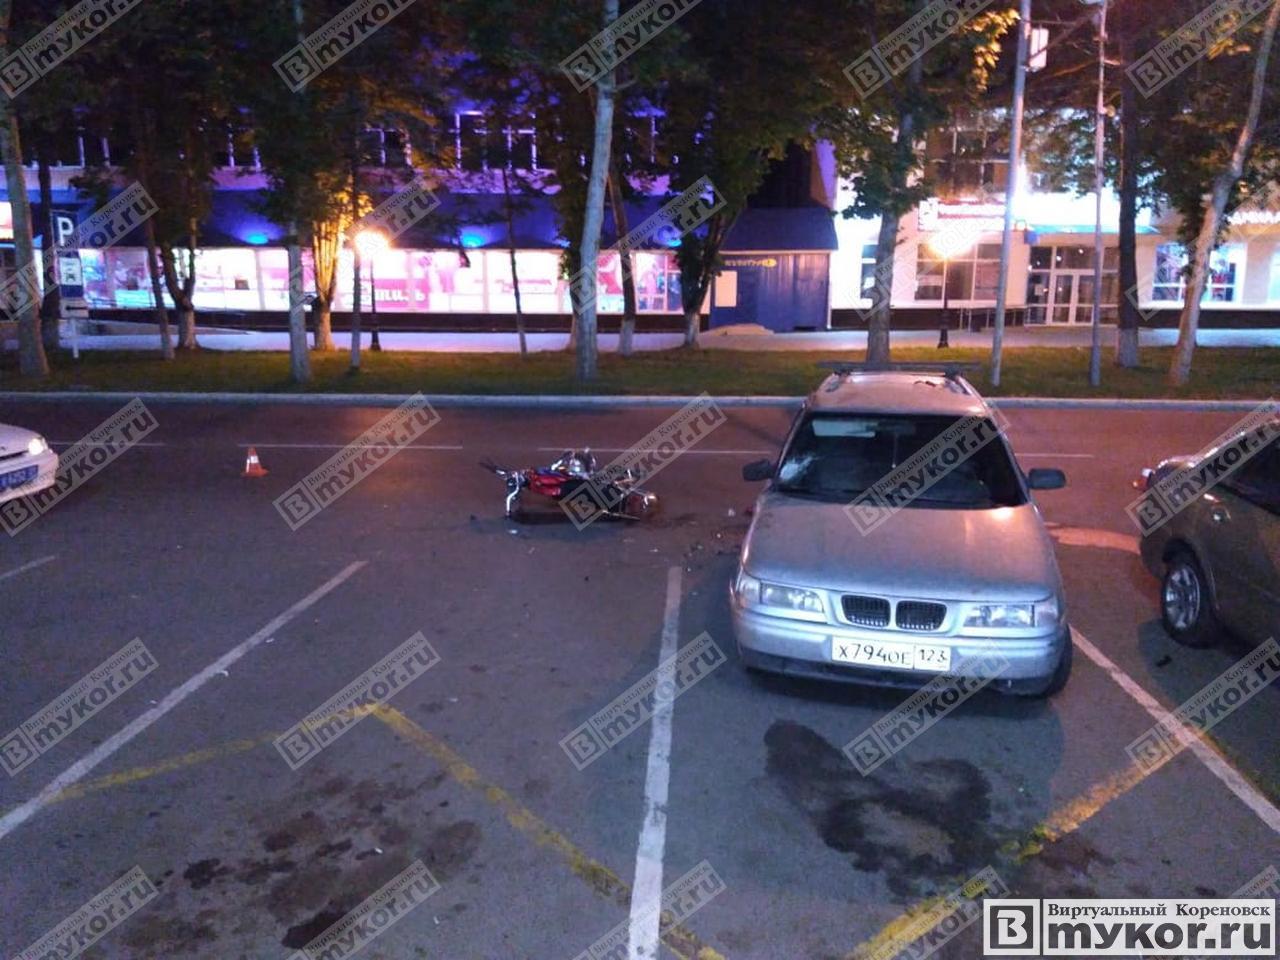 ДТП Кореновск 7 июня 2019 года